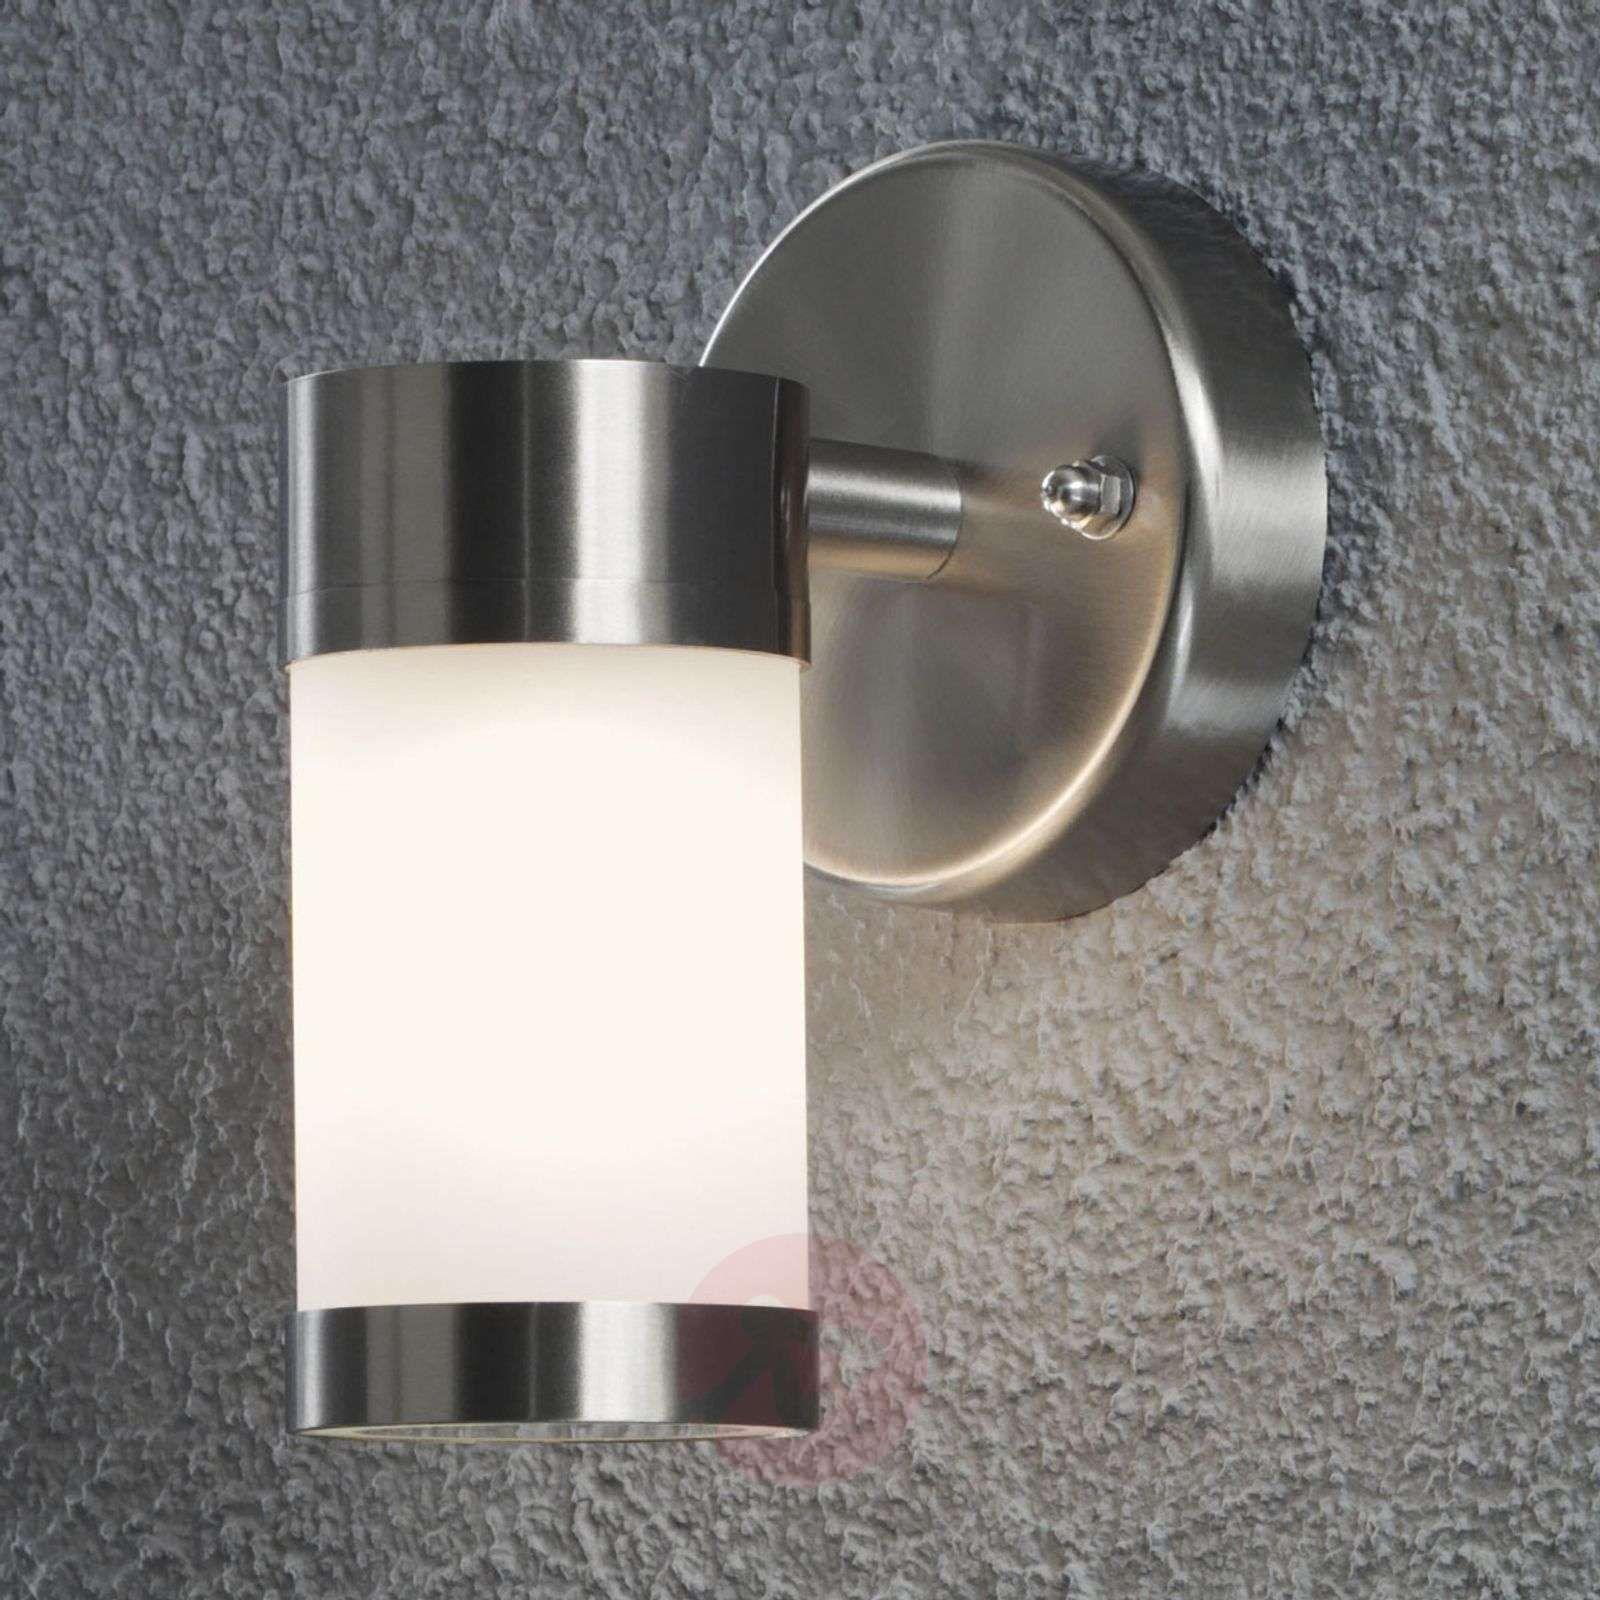 Prosta Zewnetrzna Lampa Scienna Modena 1 Punktowa Outdoor Wall Lighting Wall Lights Bulb